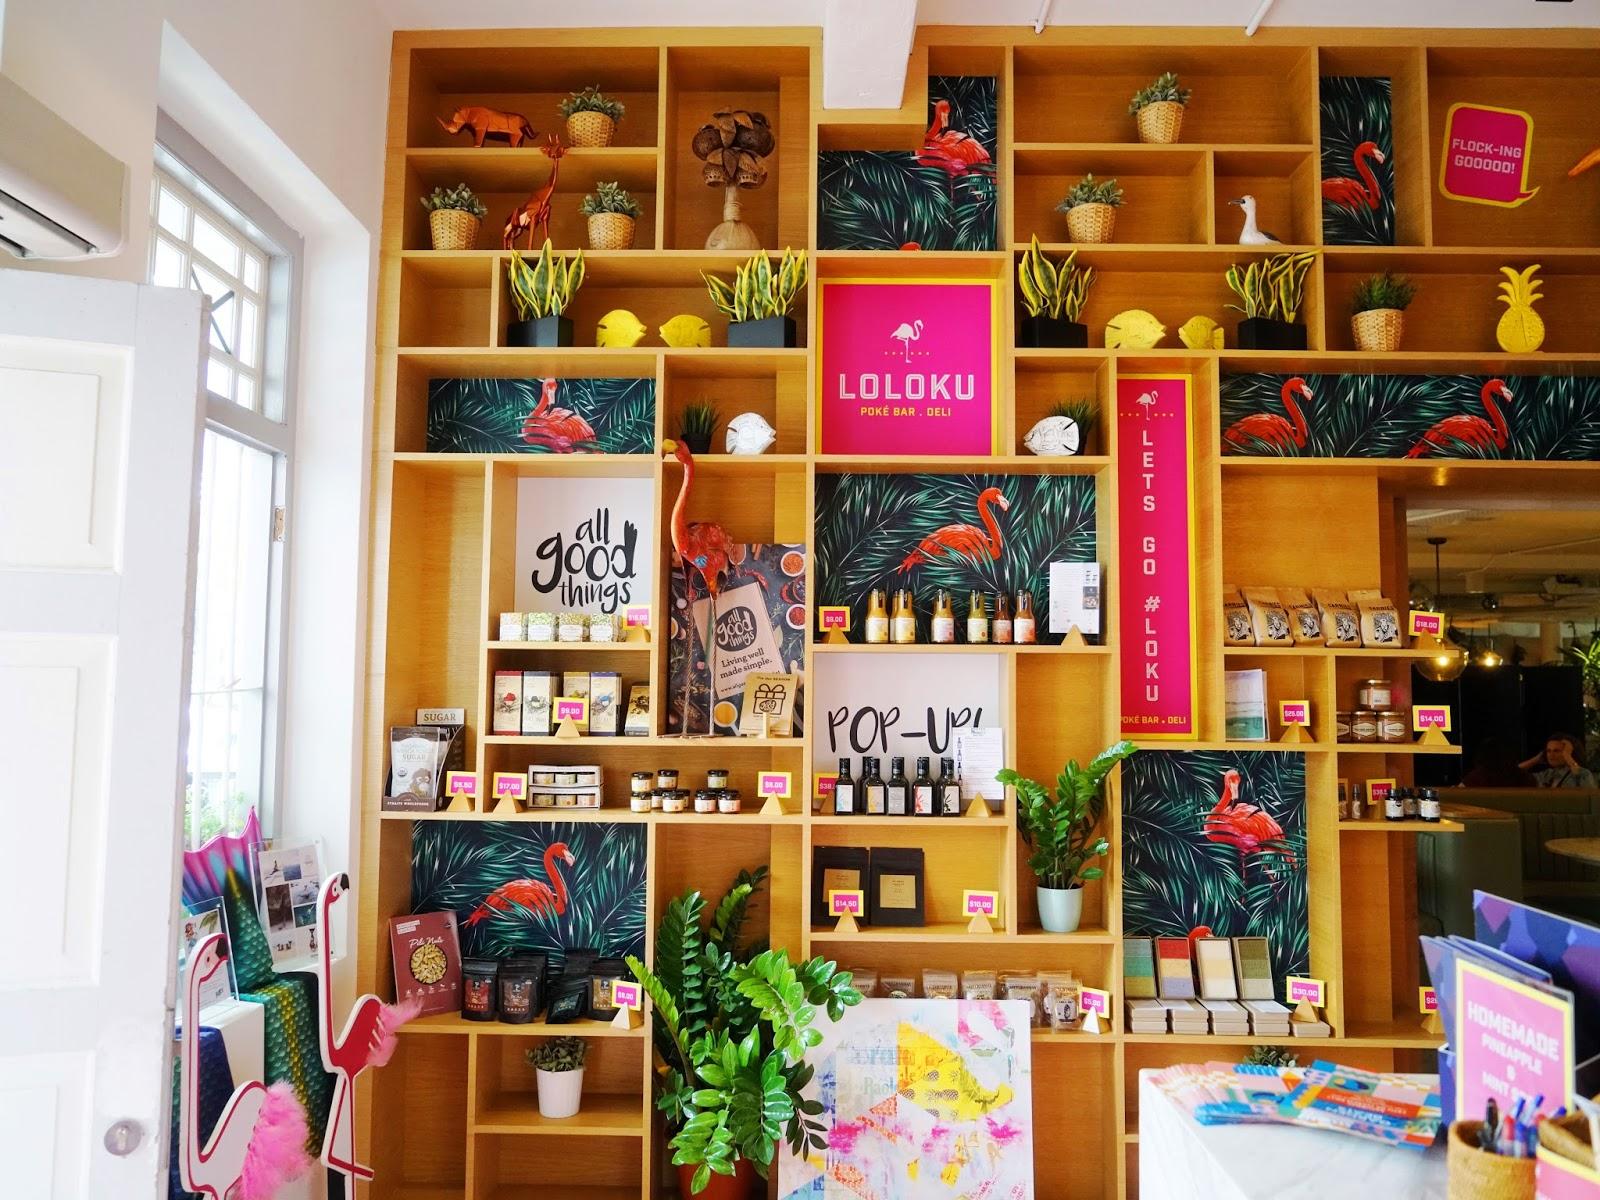 Loloku Shelves.JPG